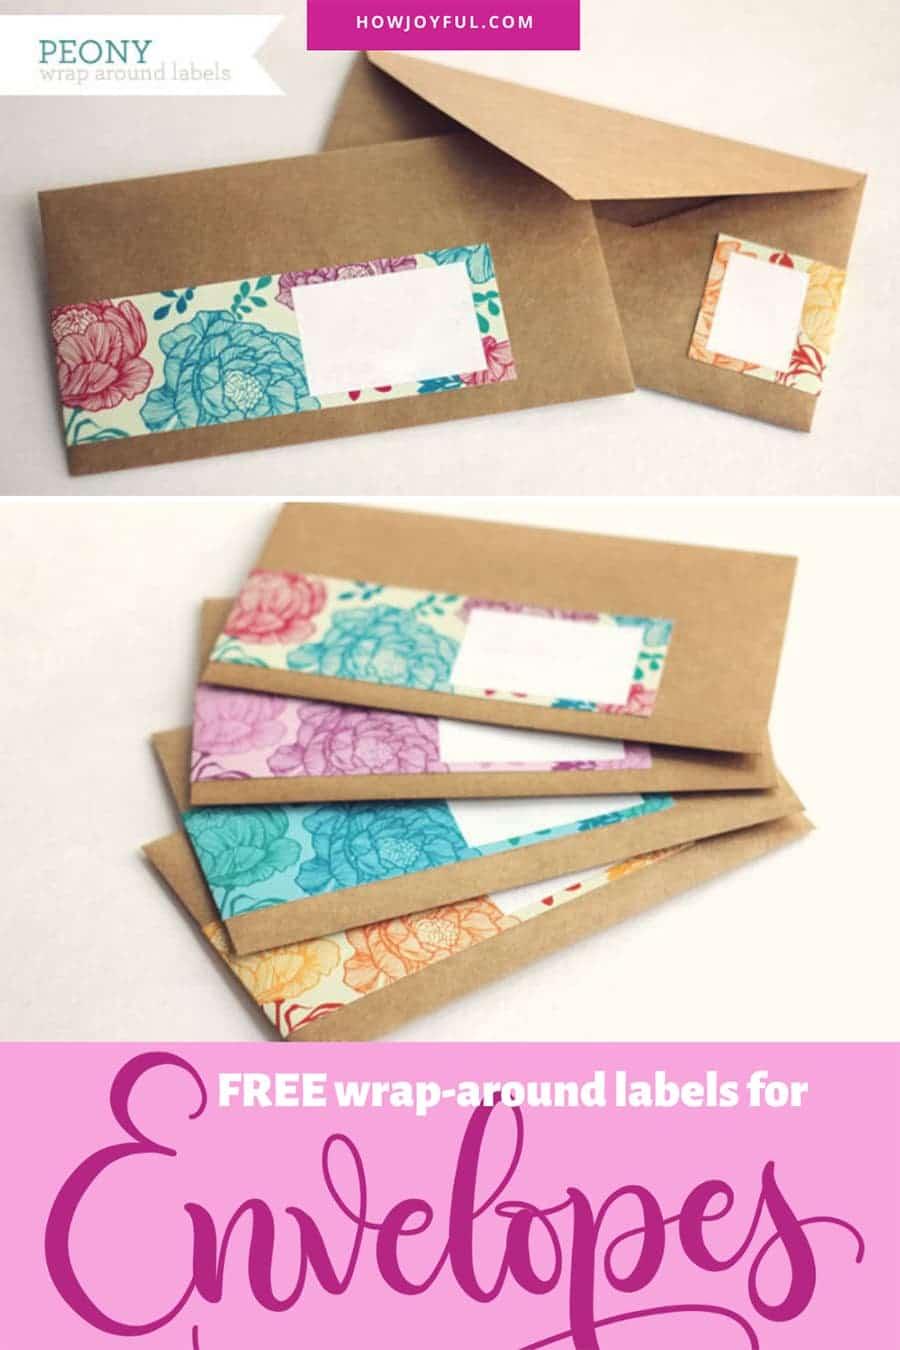 wrap-aroud envelopes